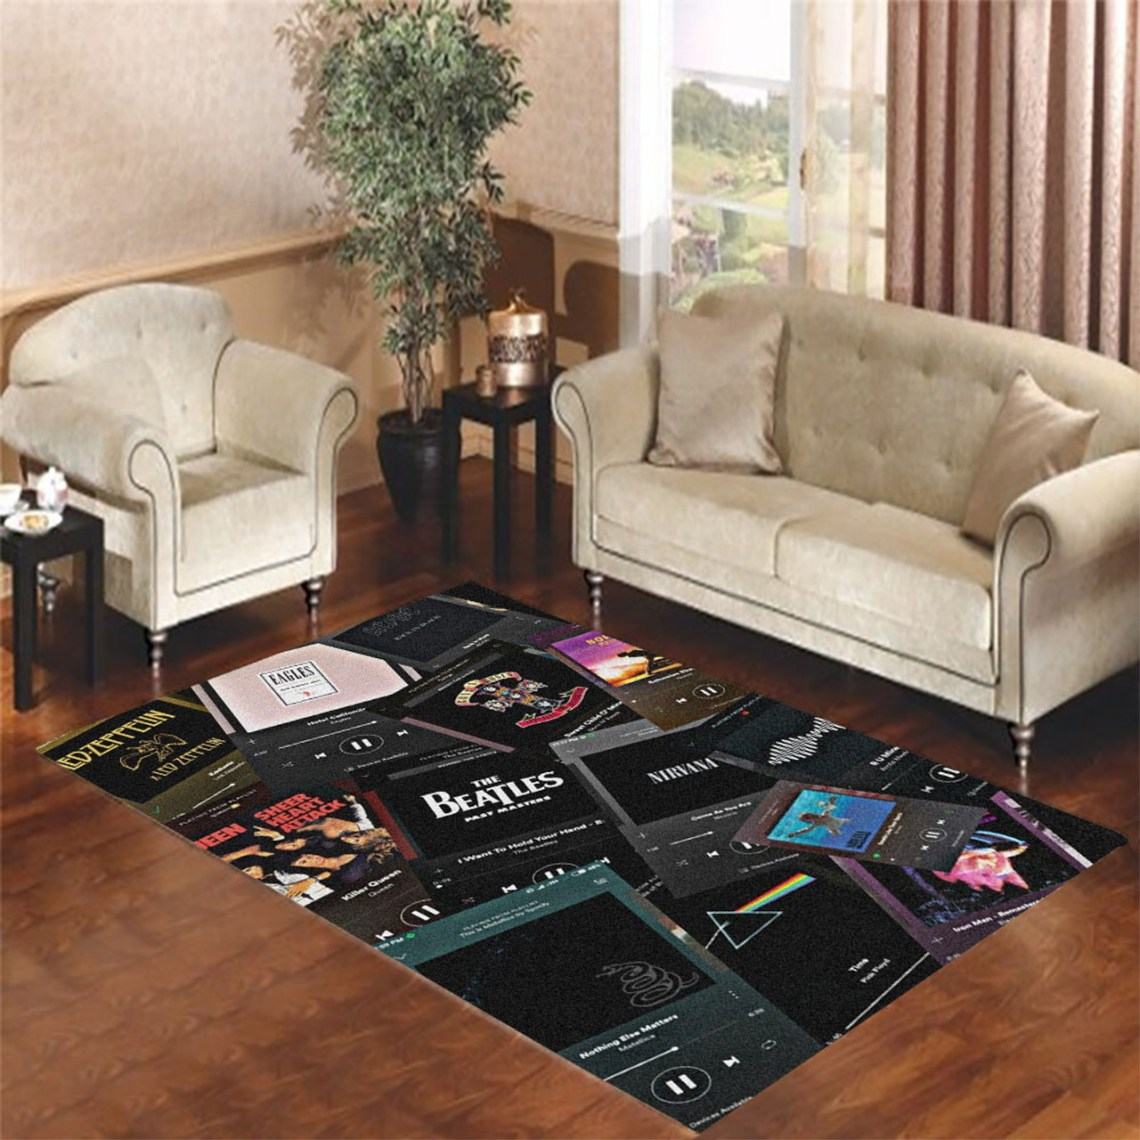 Aesthetic 80s Rock Metal Living Room Carpet Rugs Coverszy